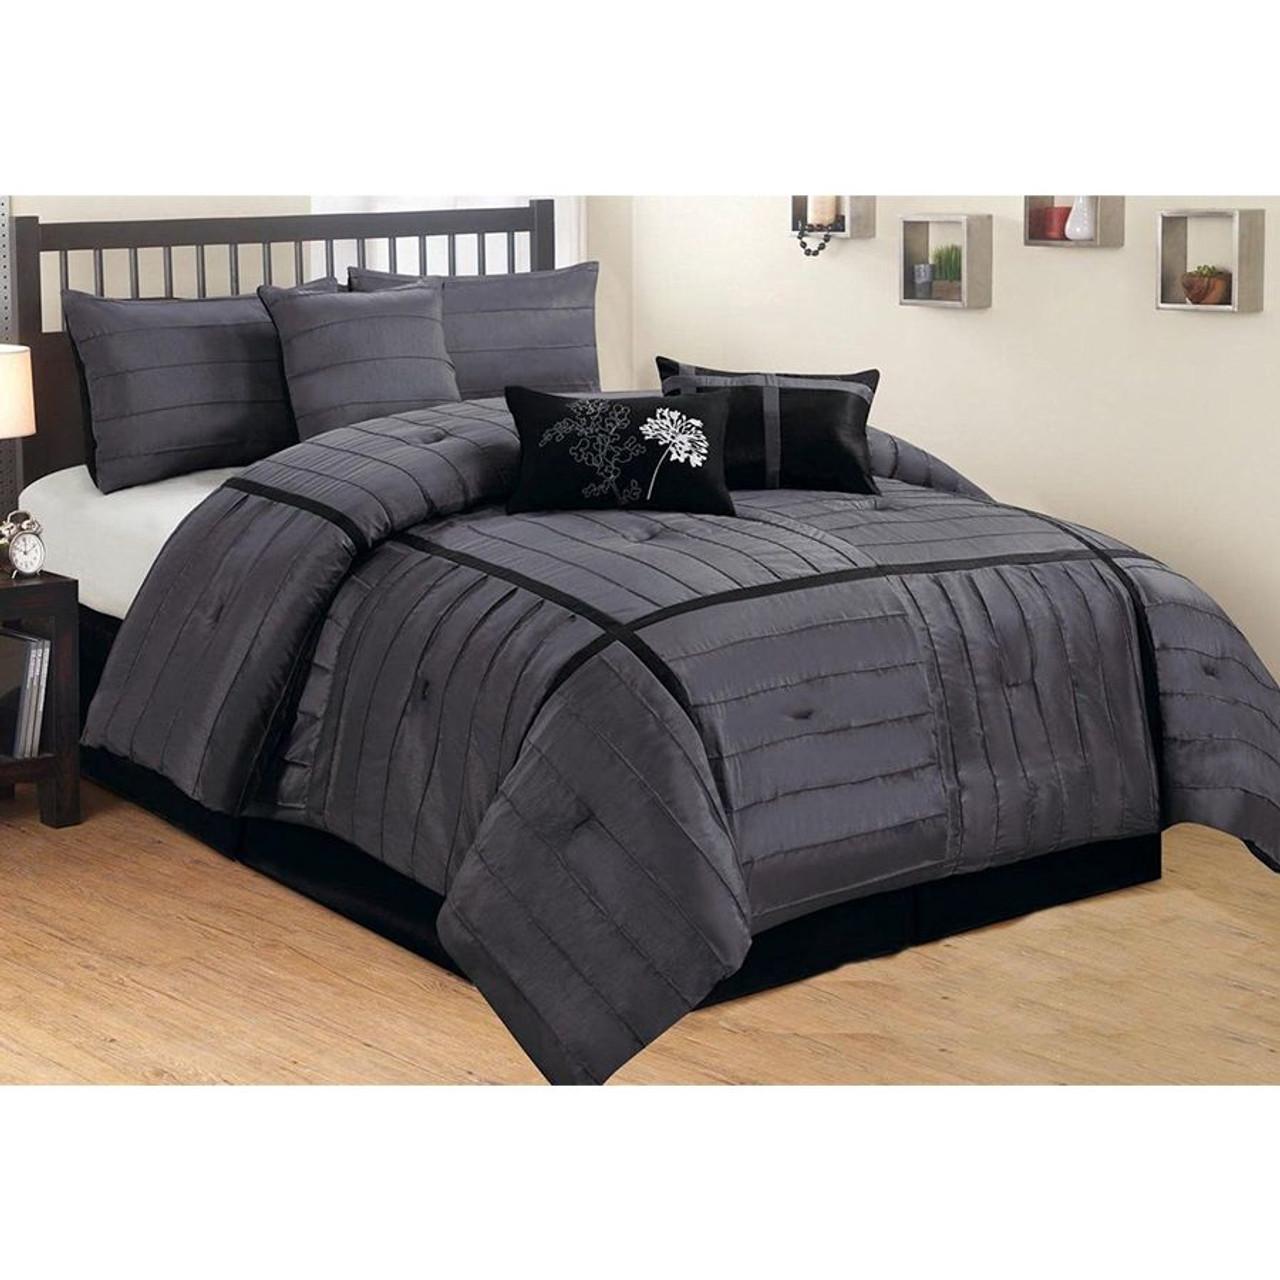 7 Pc Black Grey Charcoal Faux Silk Checkered Comforter Set Legacy Decor